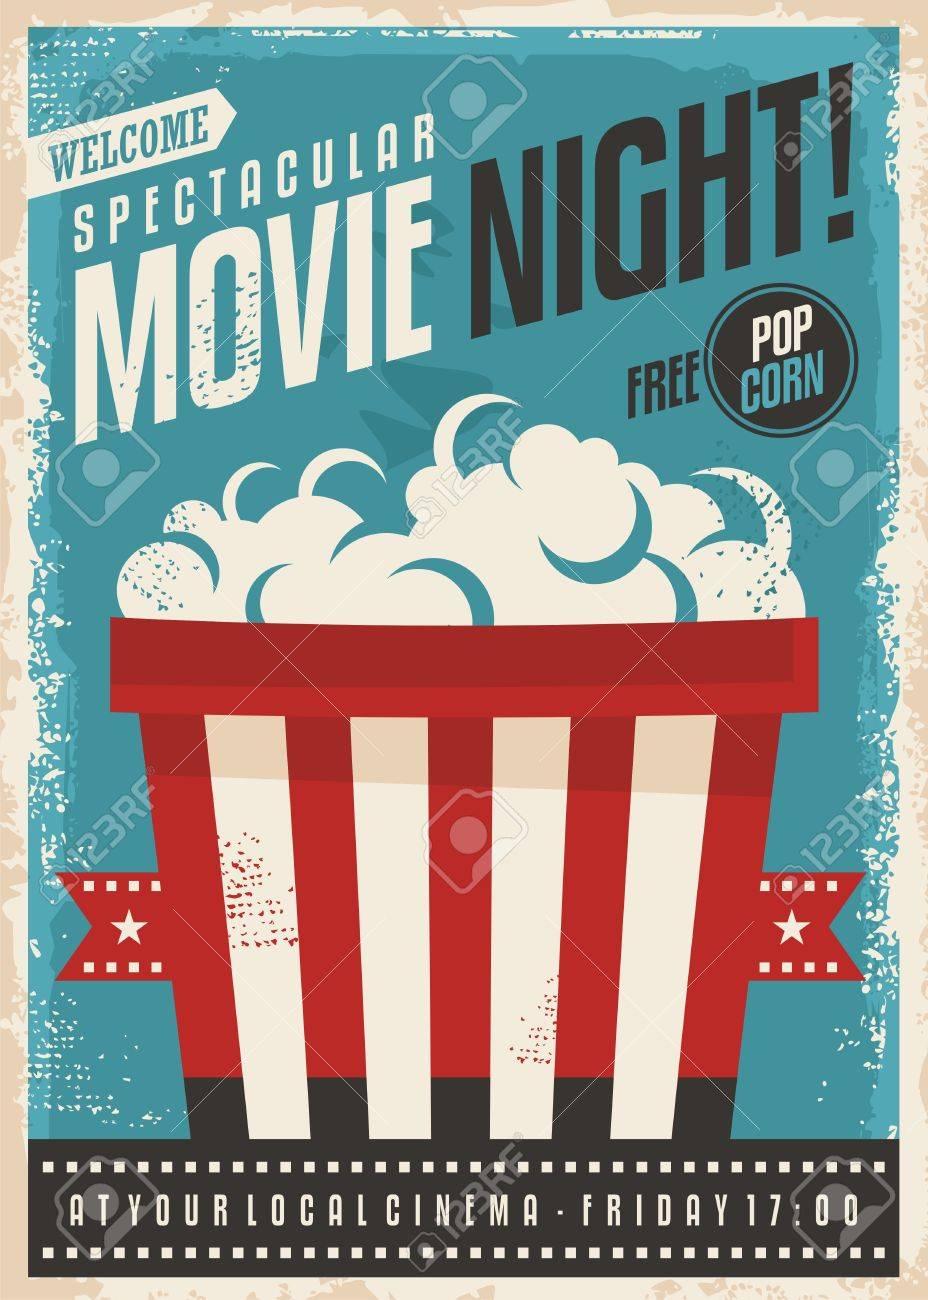 Filmkino Nacht Retro-Poster-Design. Popcorn Grafik Mit Filmstreifen ...